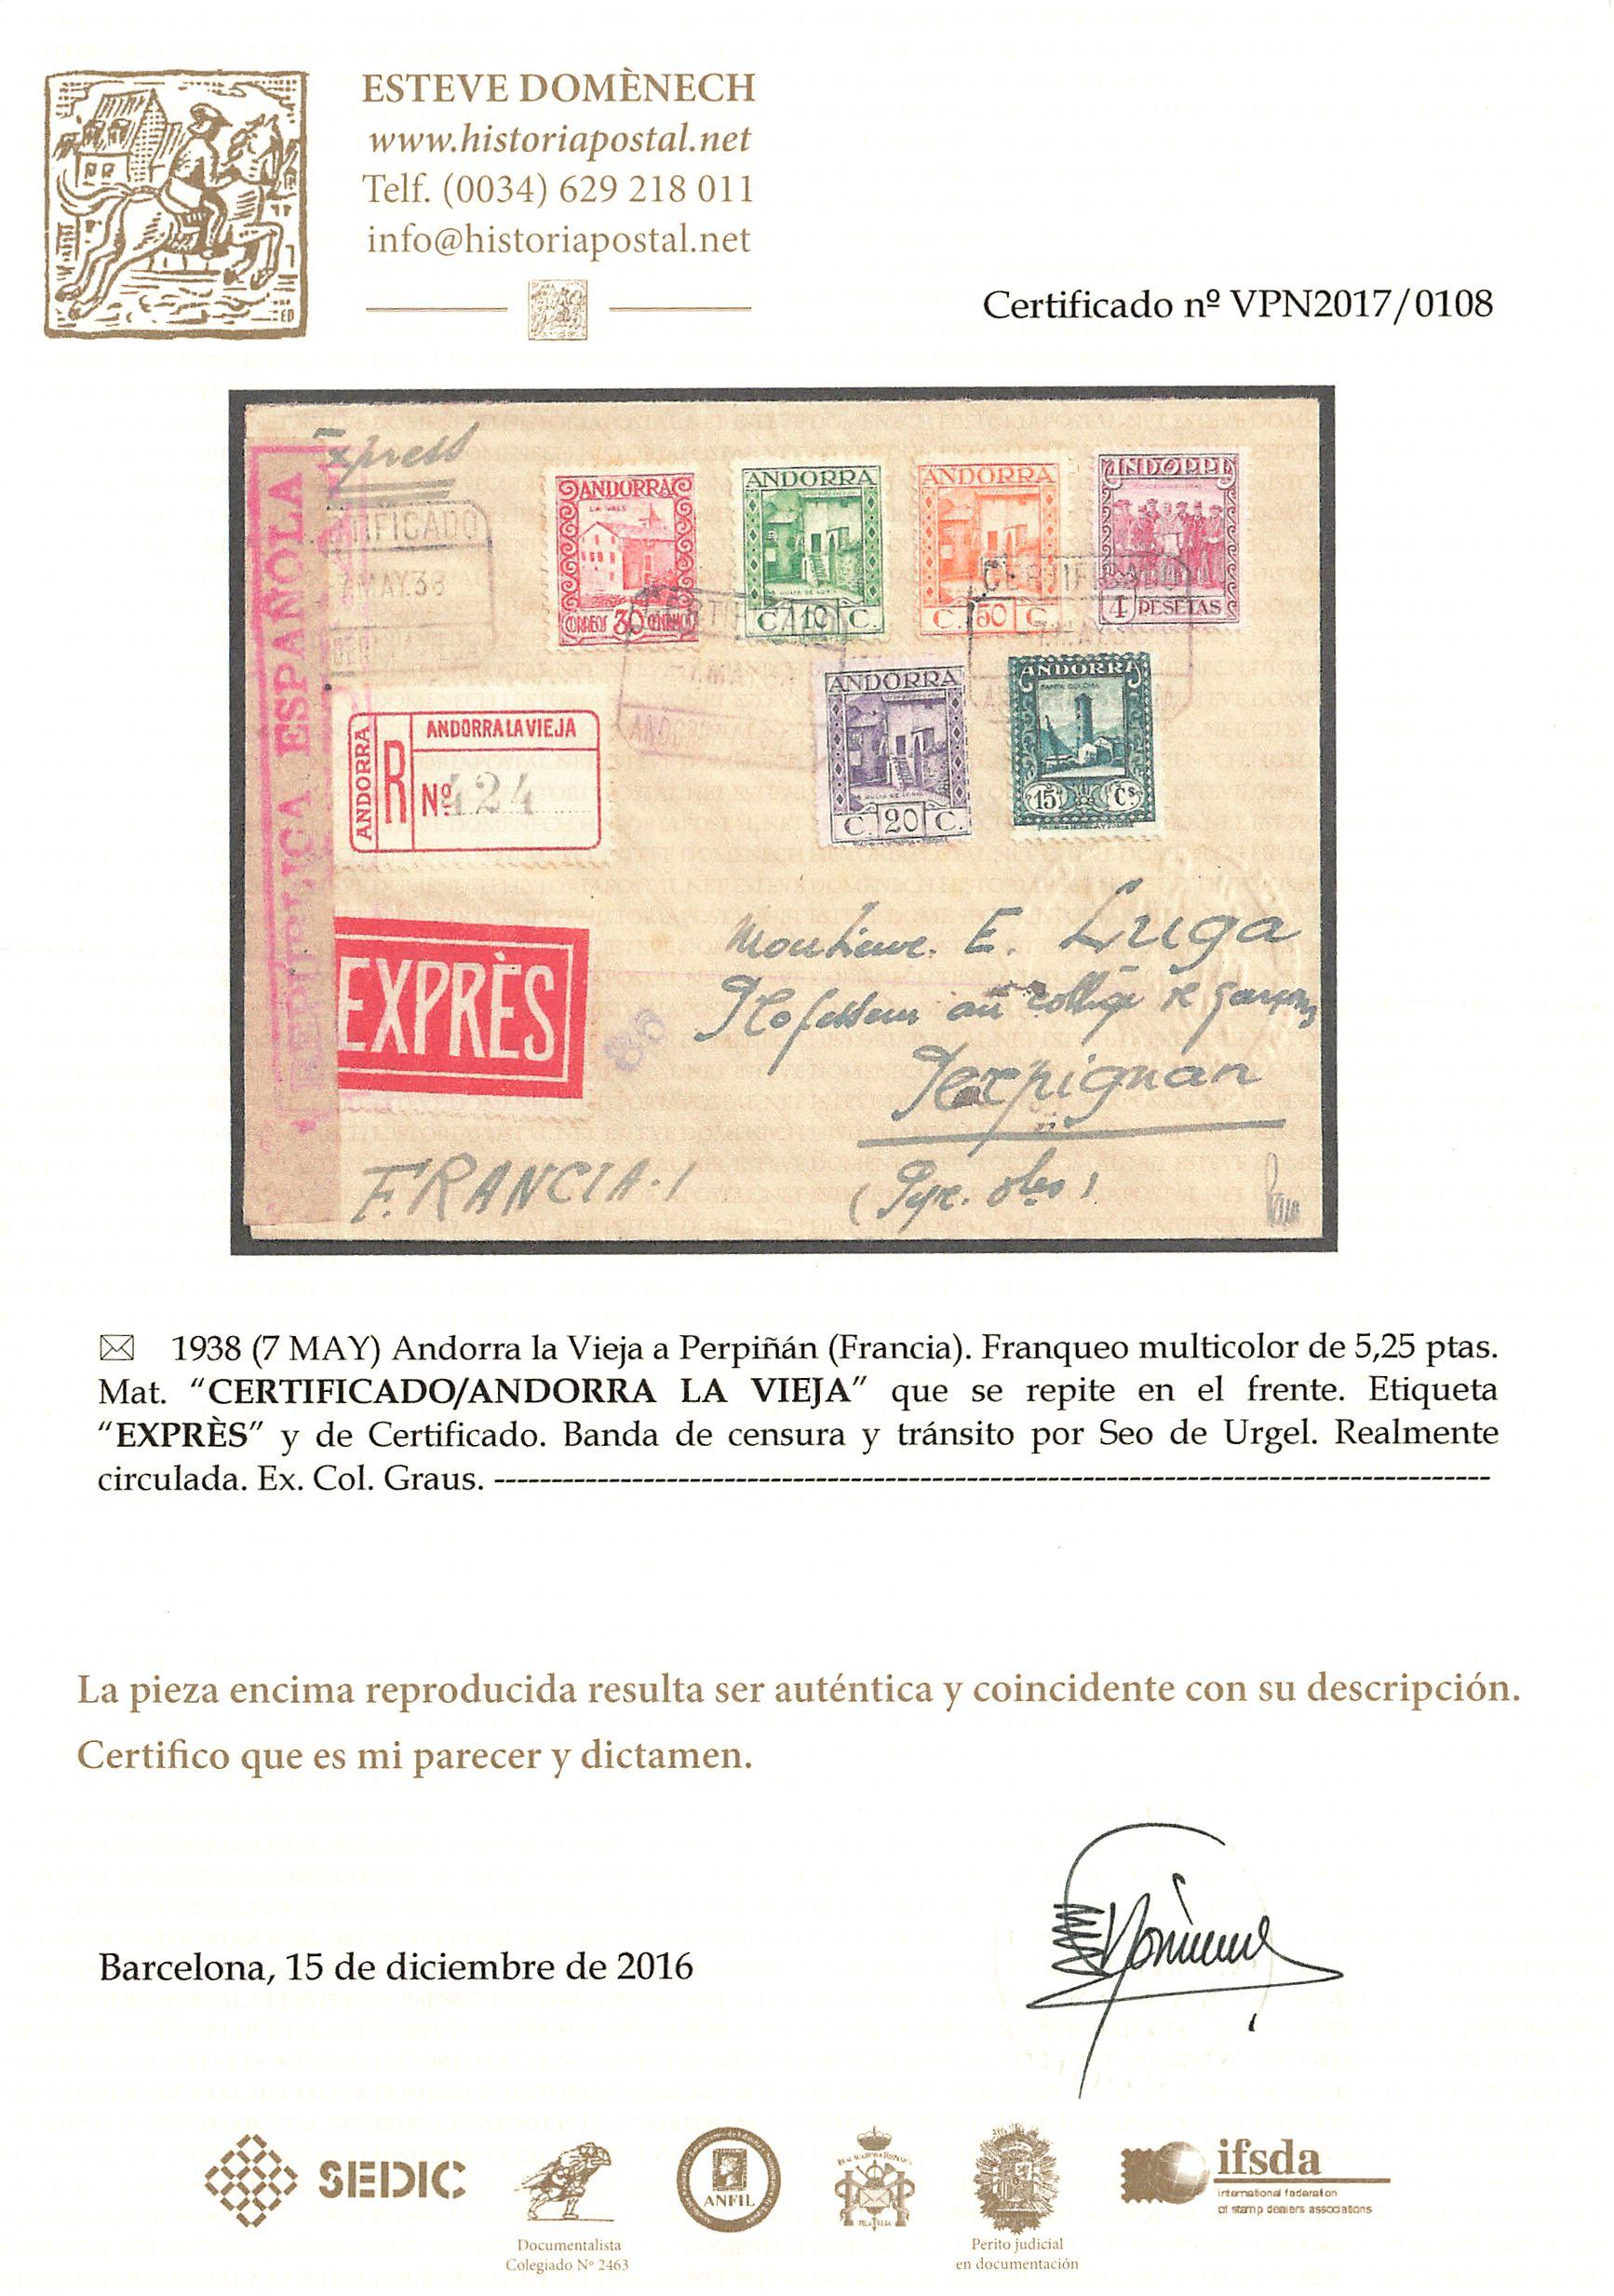 Lot 8 - europa Andorra -  Peter Harlos Auctions 42. Harlos Auktion